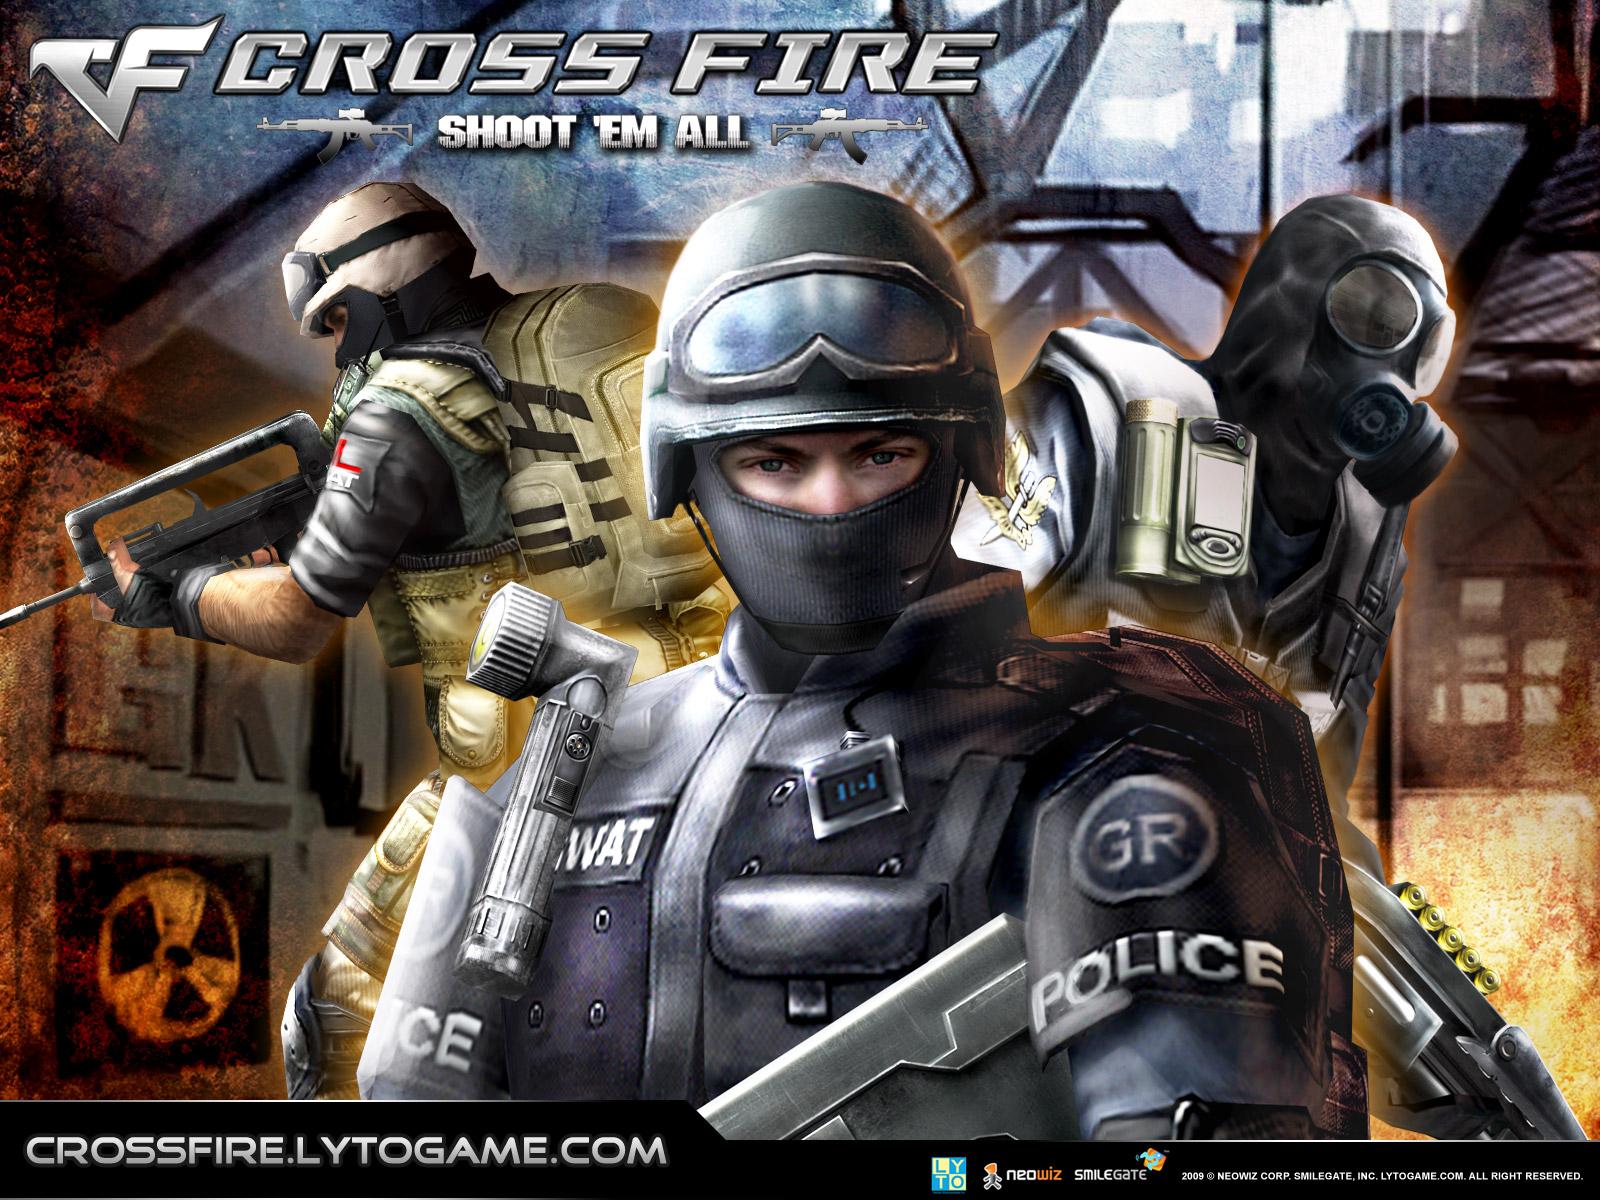 http://4.bp.blogspot.com/_Xx8toxGz3DA/TUAPlmQzJAI/AAAAAAAAAeY/zL-tiCxQrYo/s1600/Crossfire-lyto.jpg